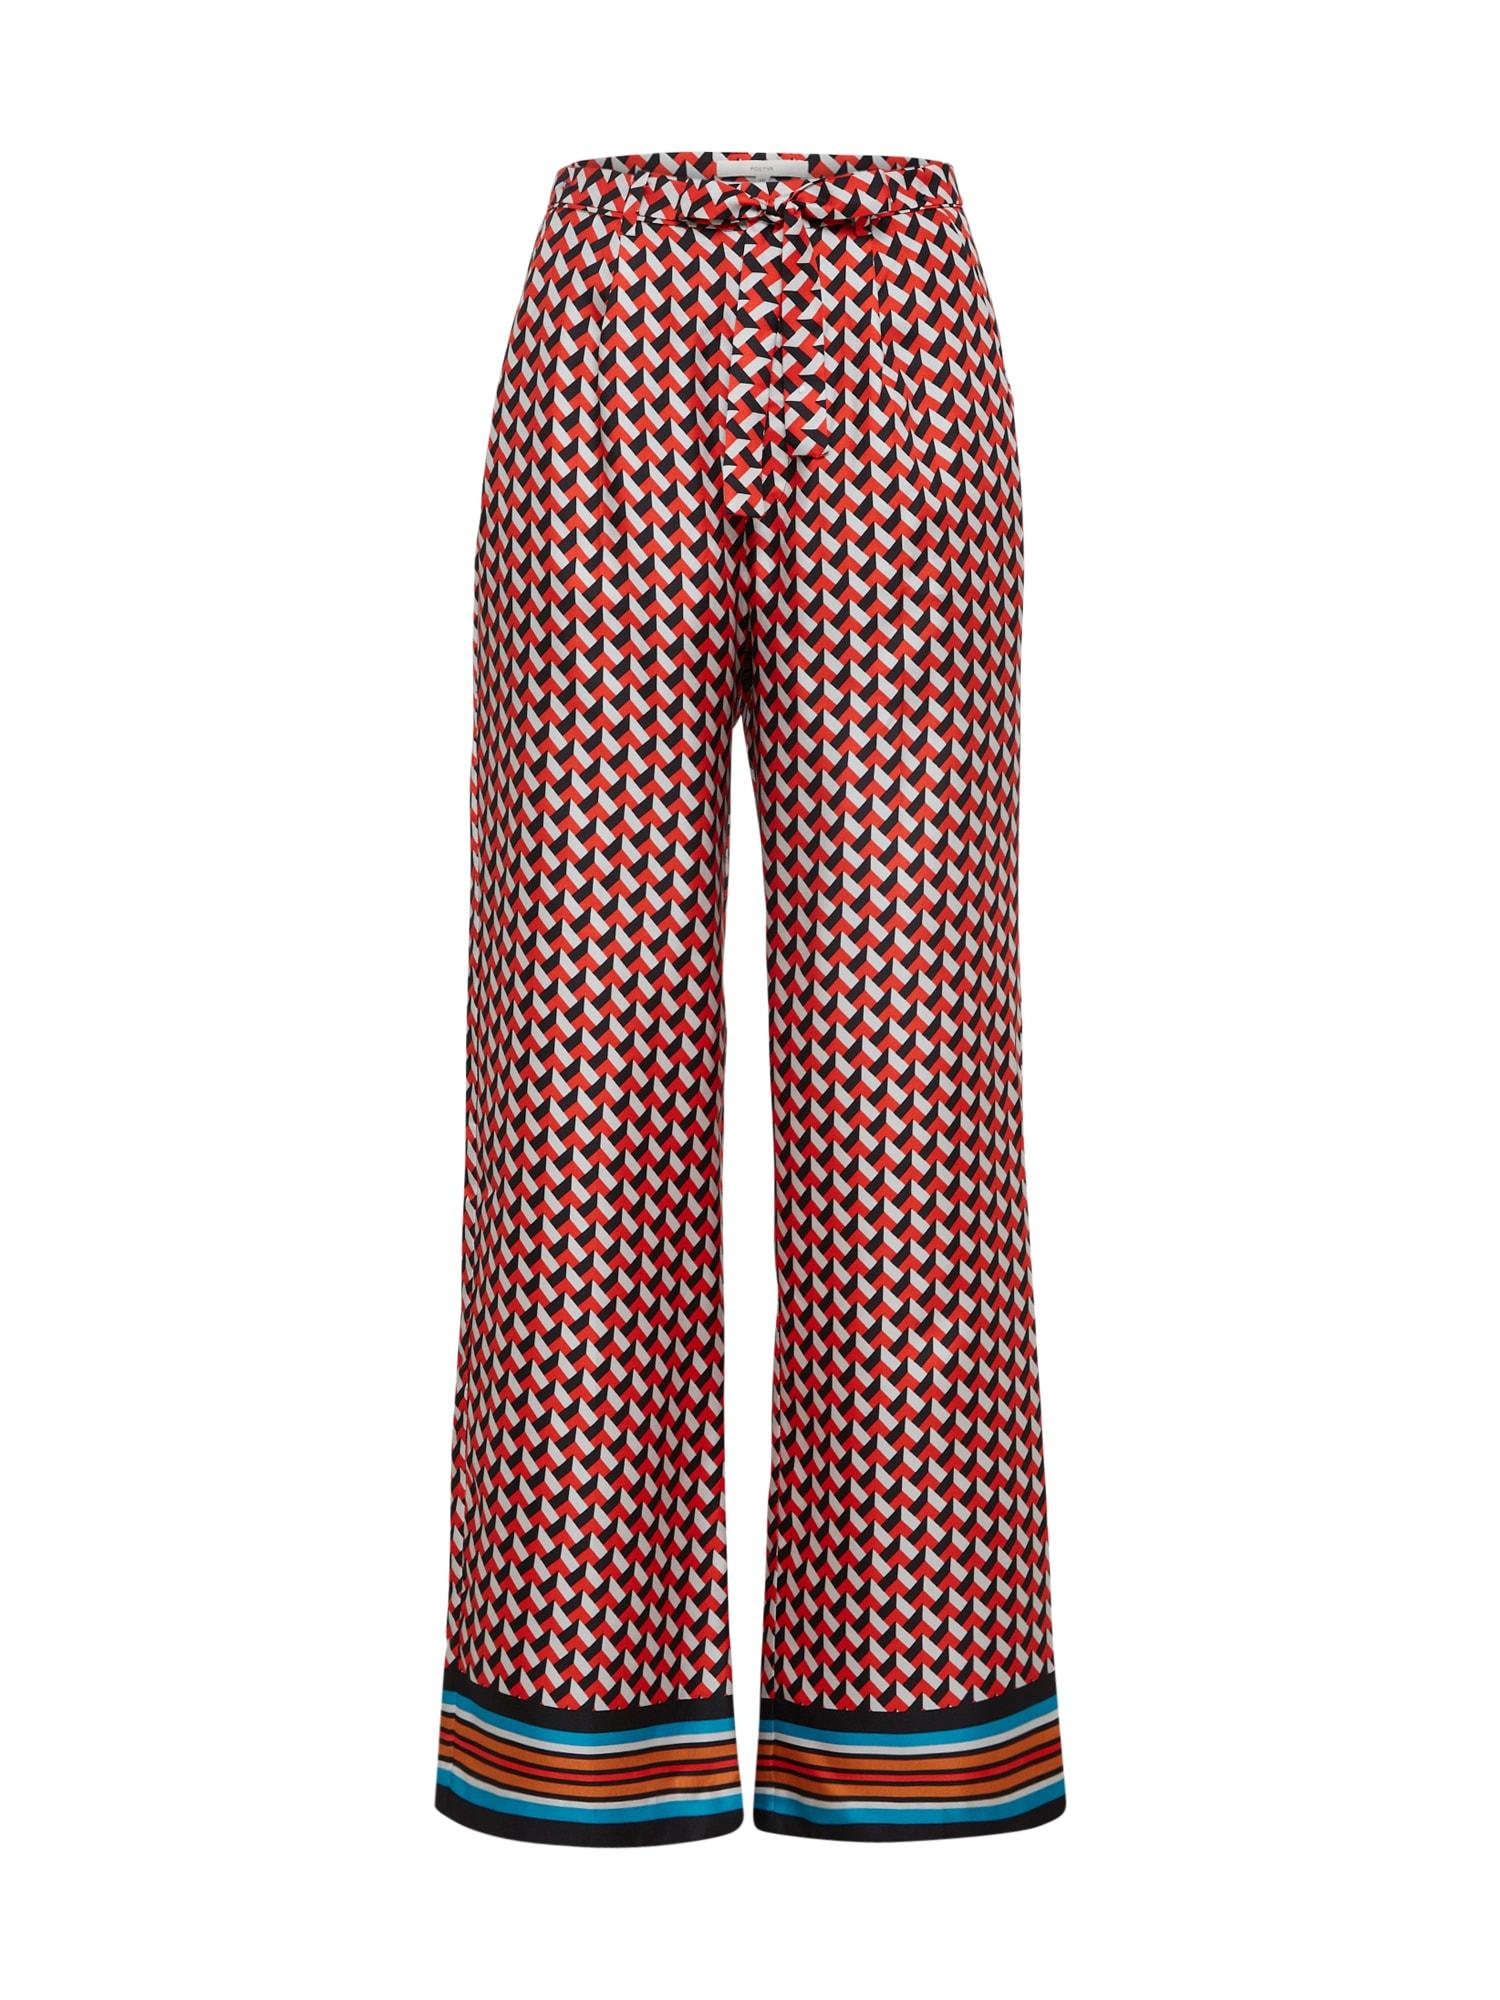 Kalhoty se sklady v pase POSIRIS červená bílá POSTYR